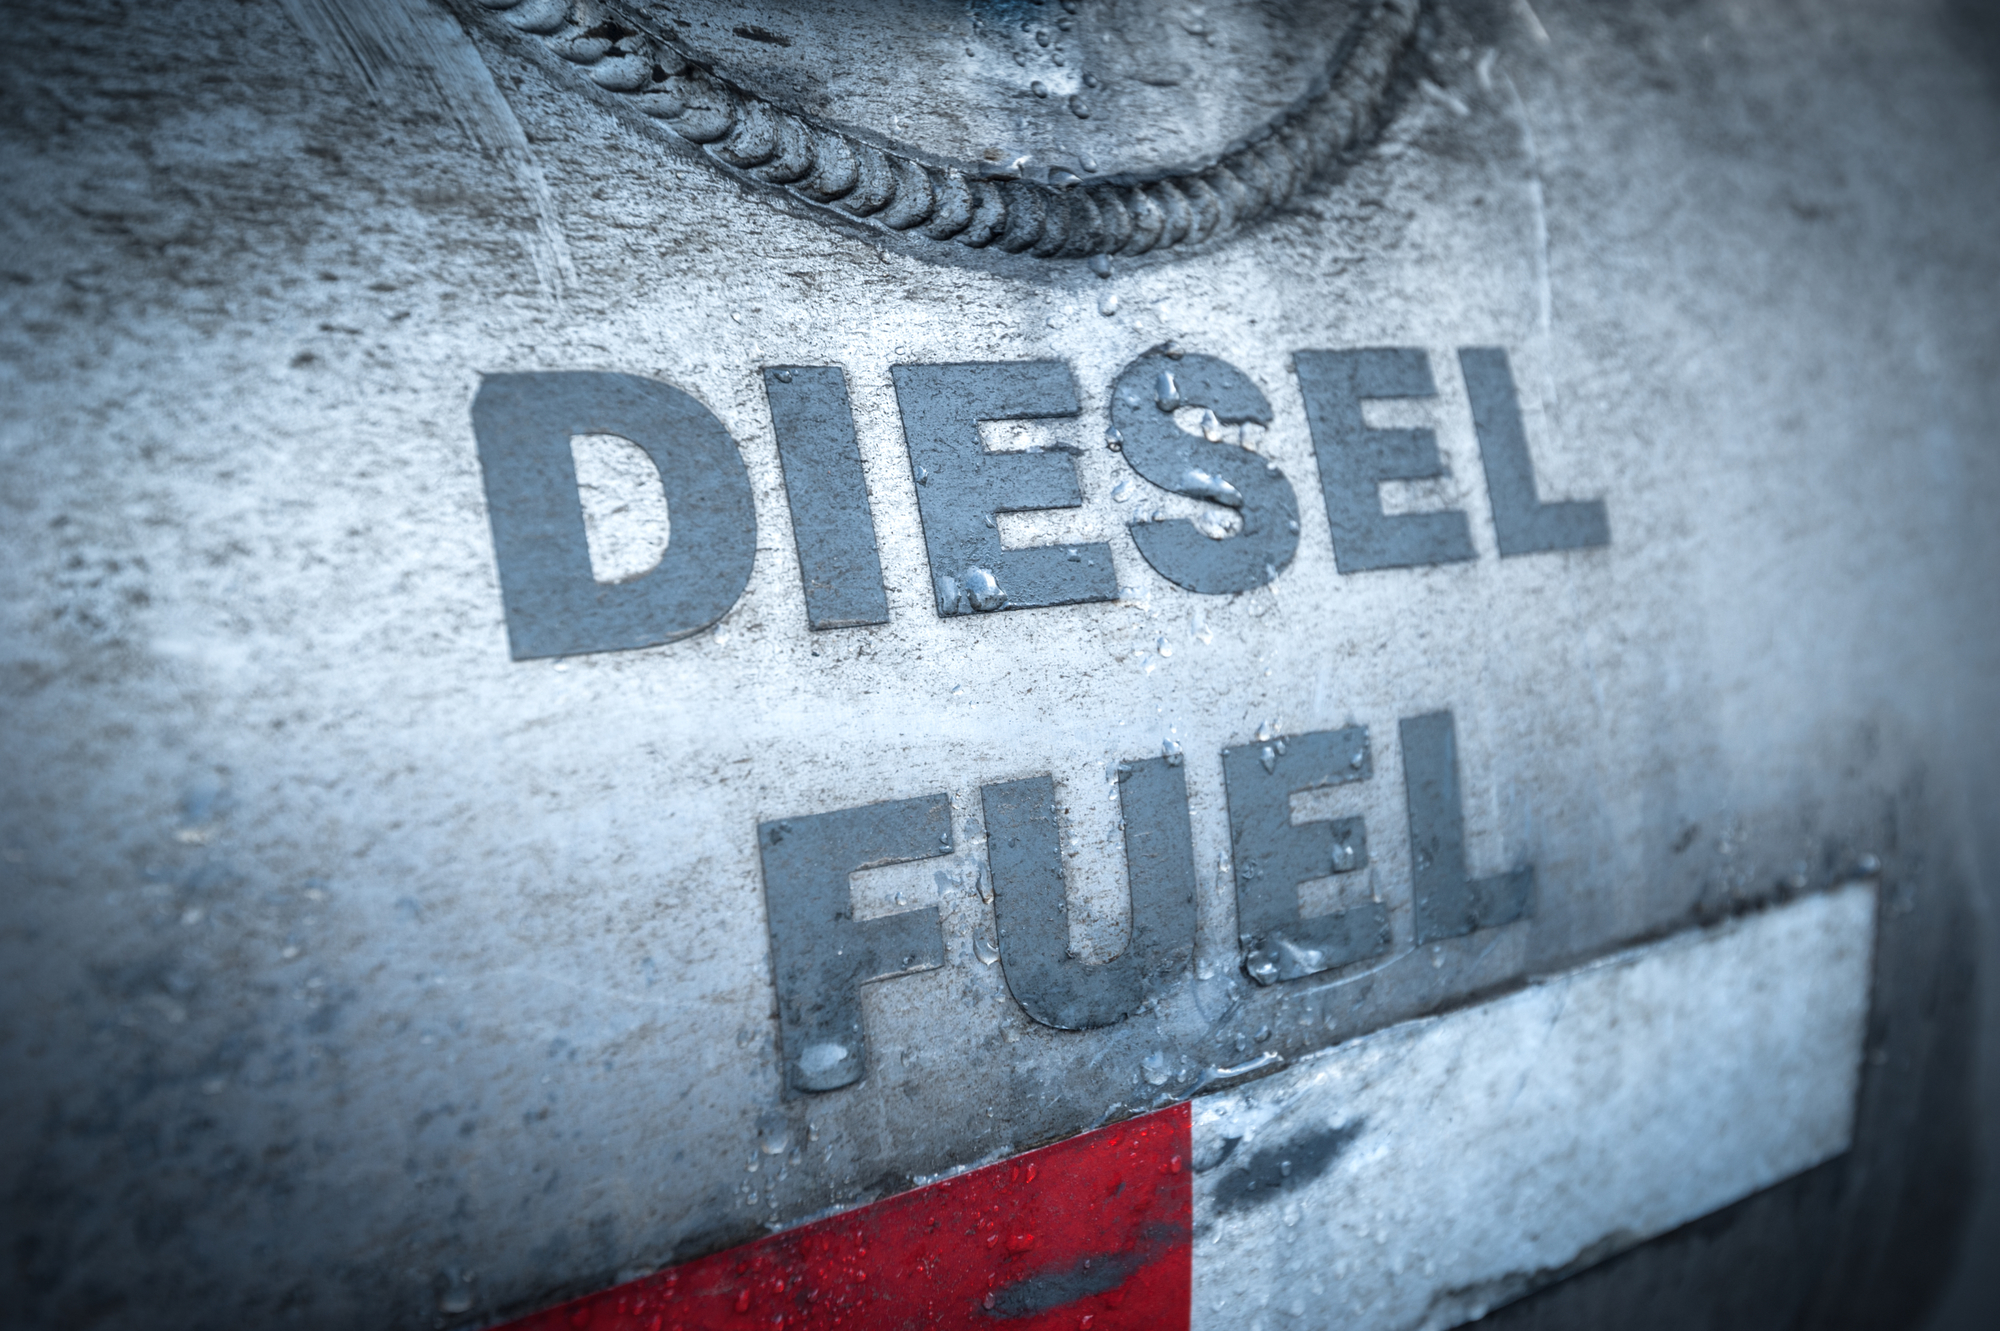 Niedergang des Diesels: Politik will Kfz-Steuer senken ...